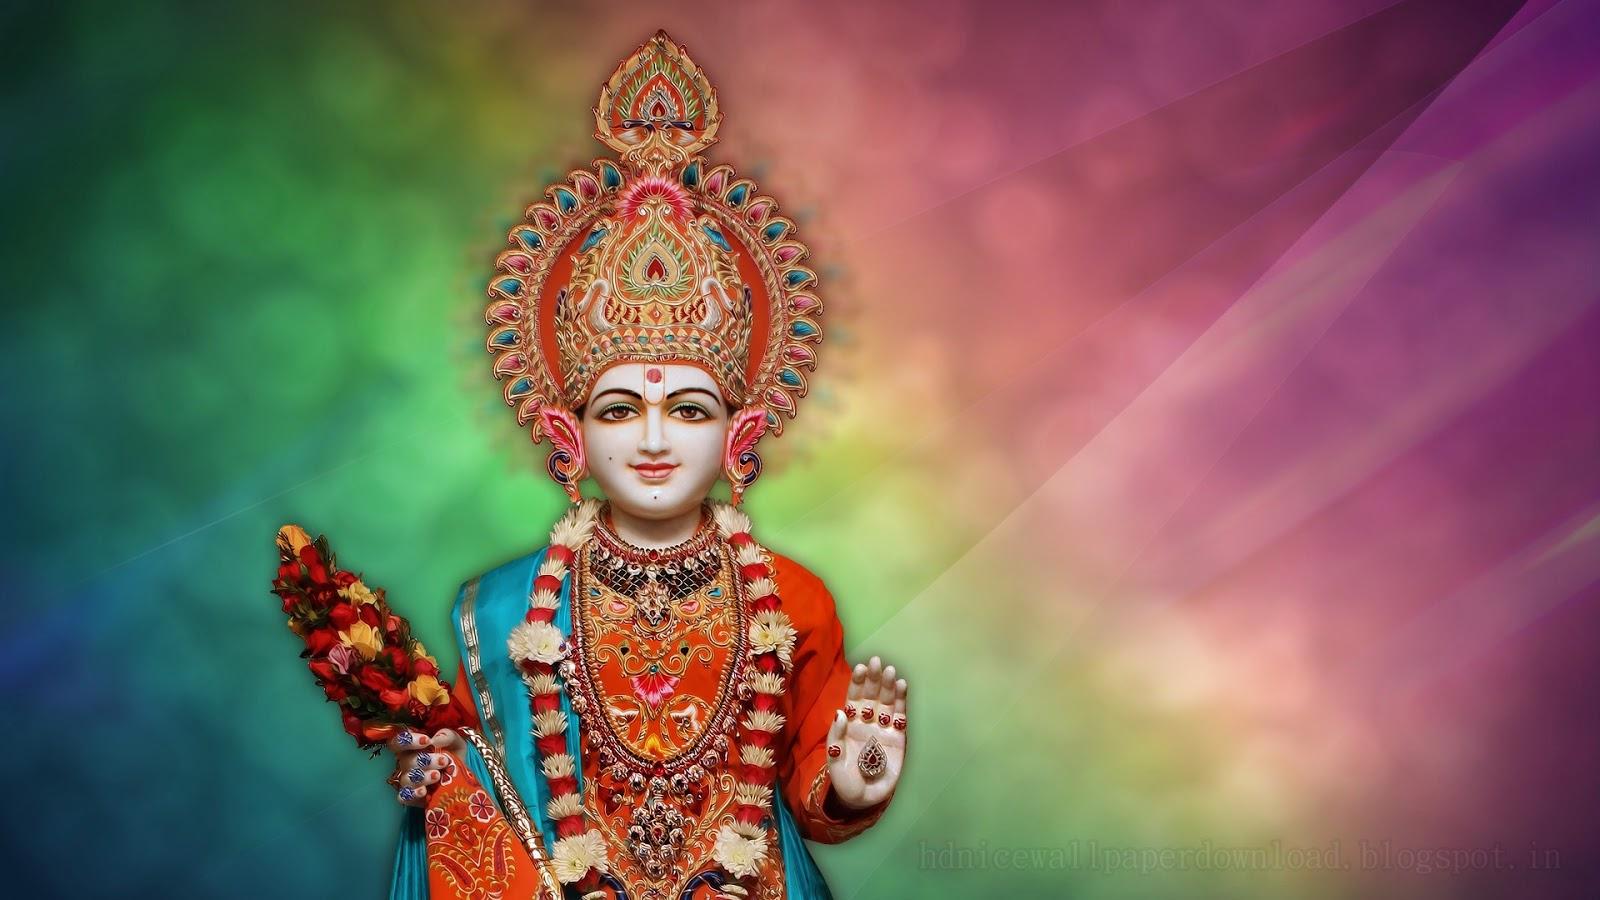 Bhagwan Swaminarayan HD Wallpaper